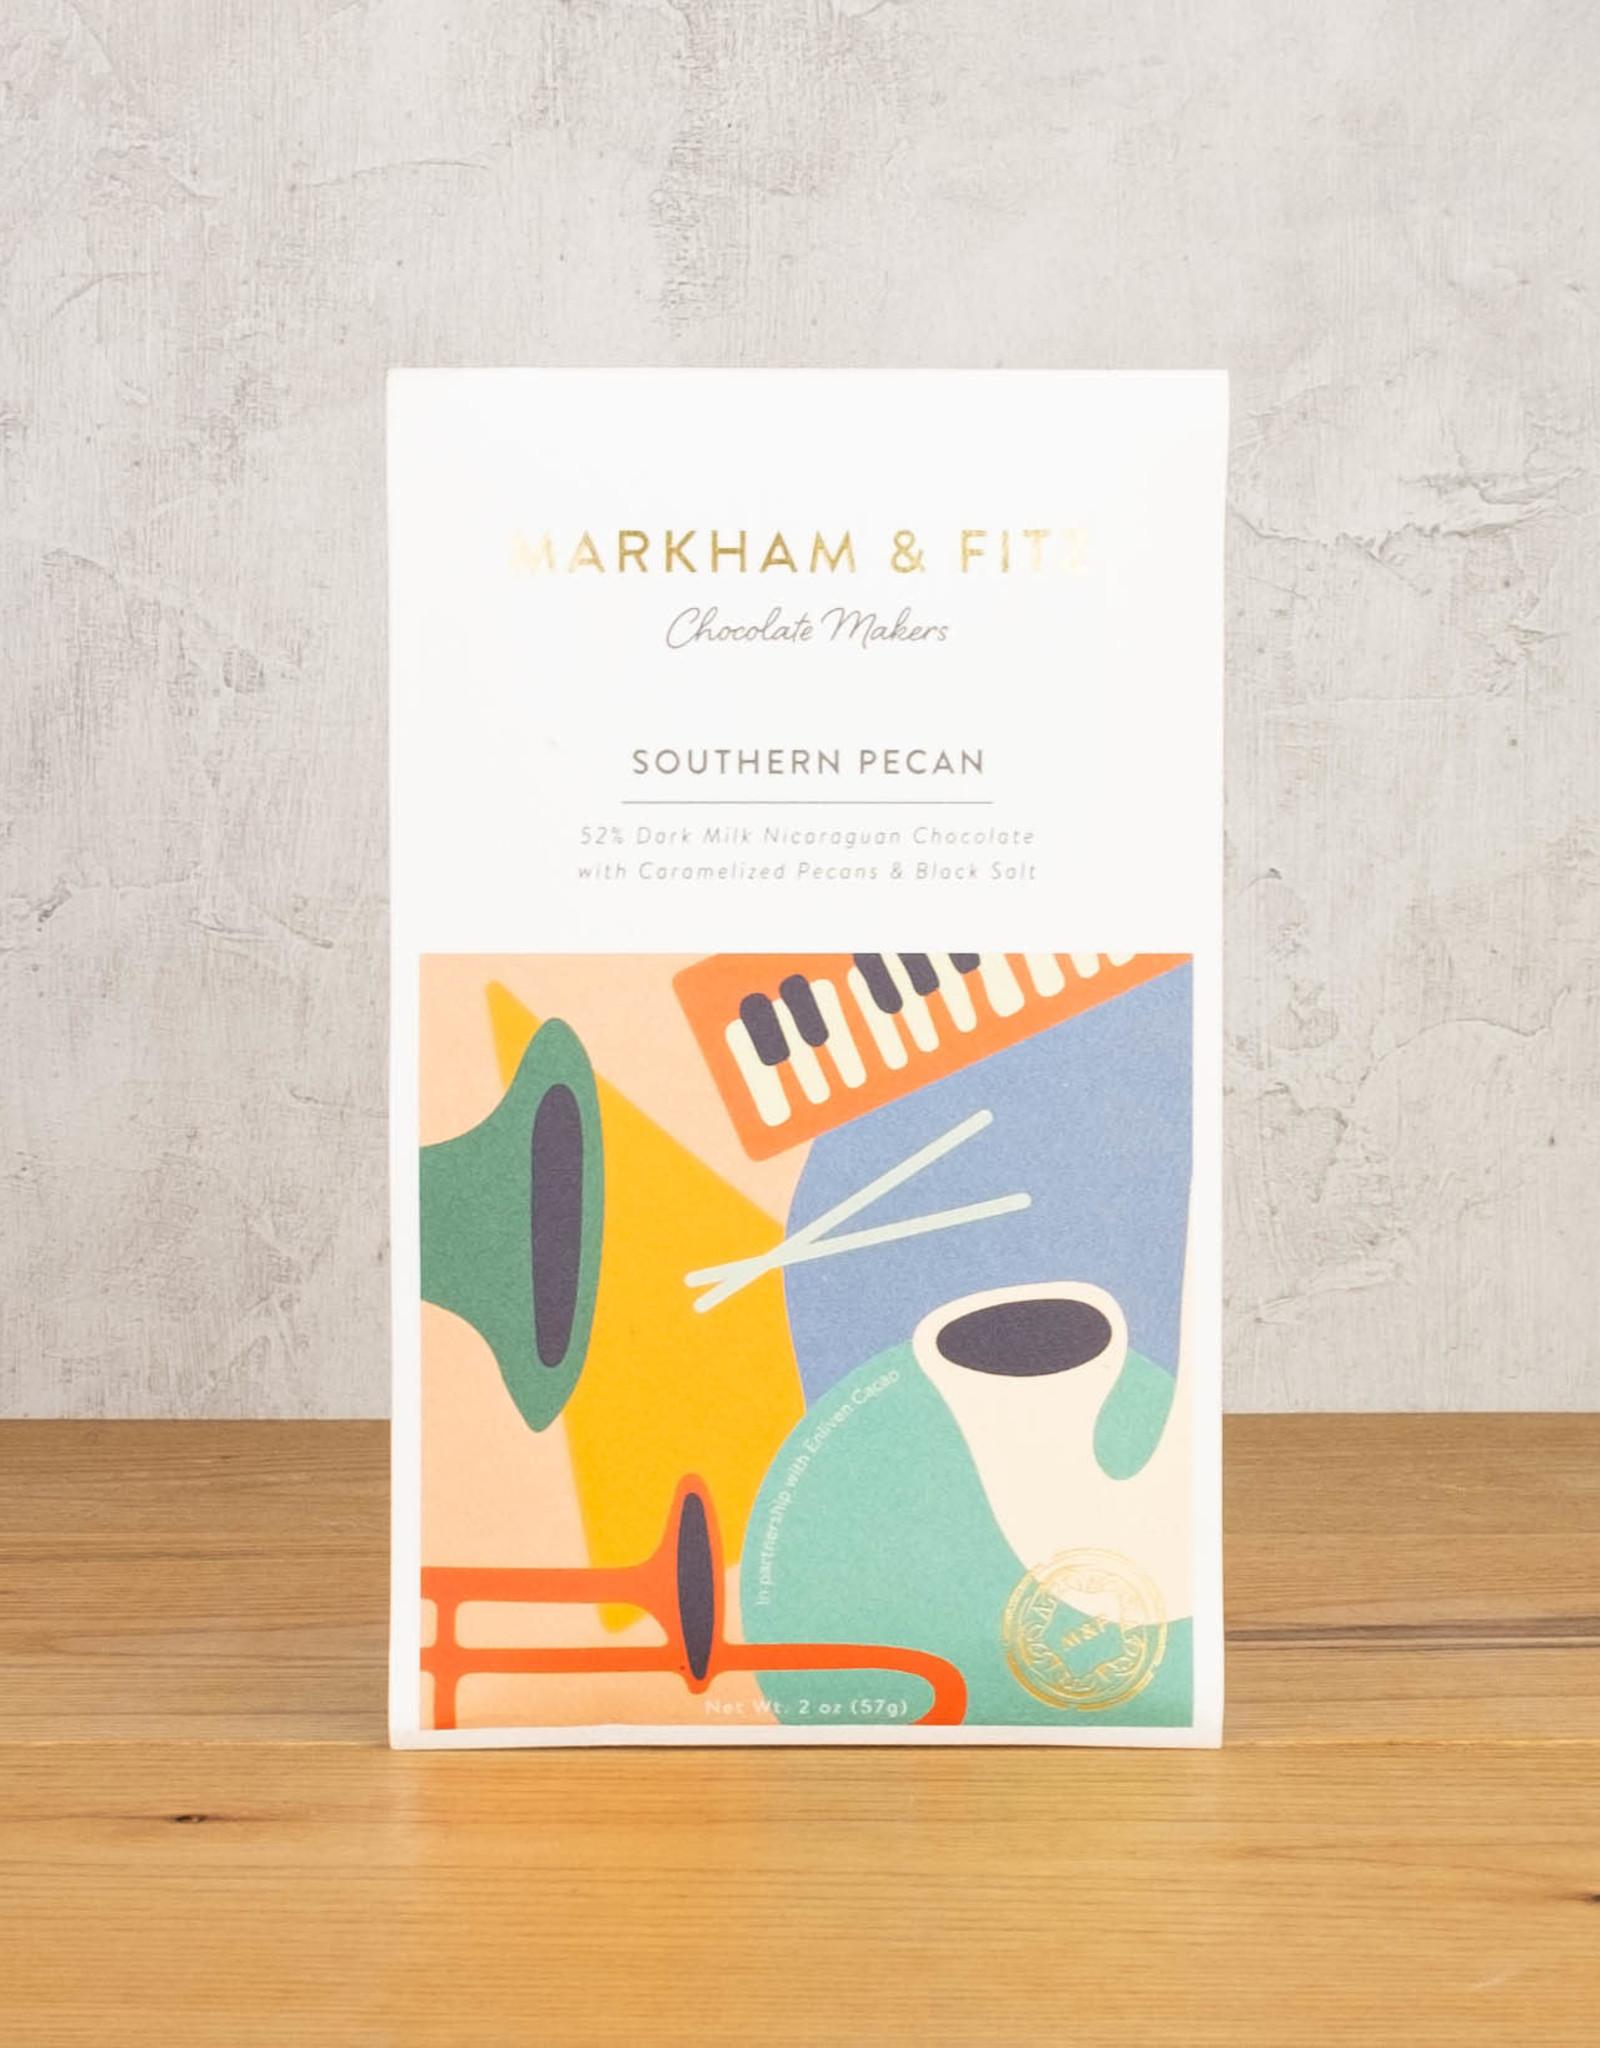 Markham & Fitz Dark Milk & Pecans 52%